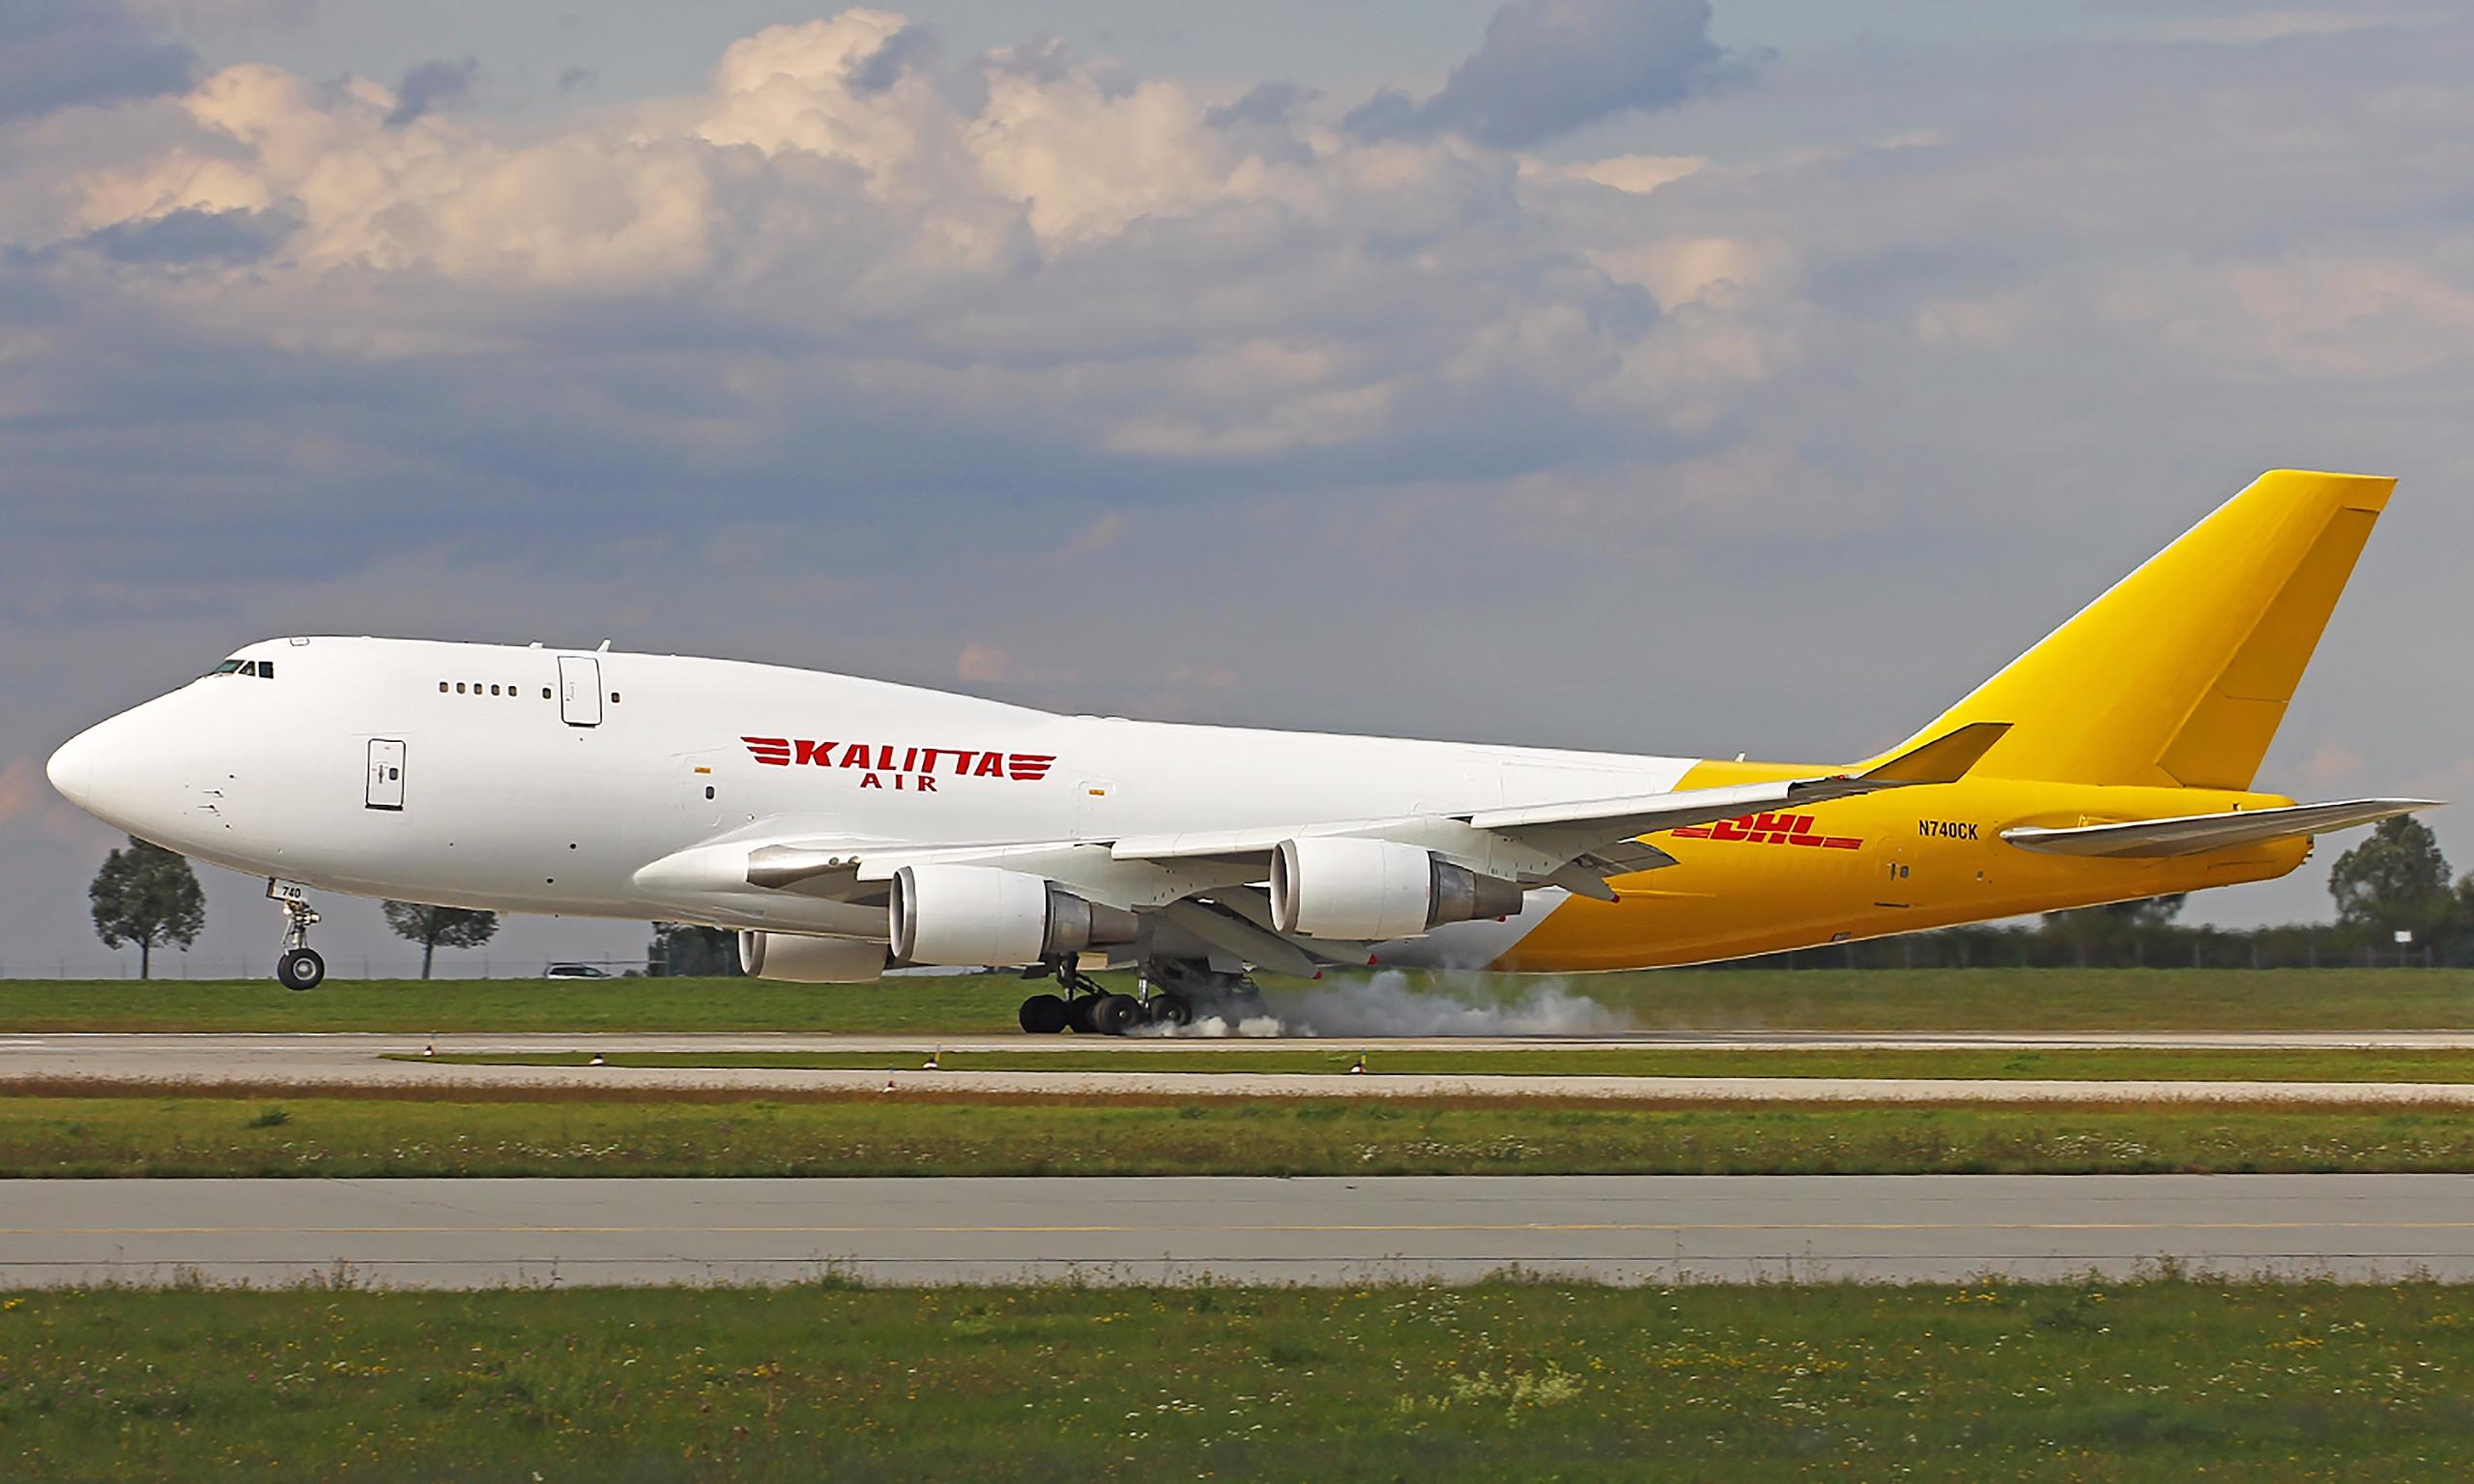 Leipzig/Halle Airport 04.09.201 - axel1967 | ello